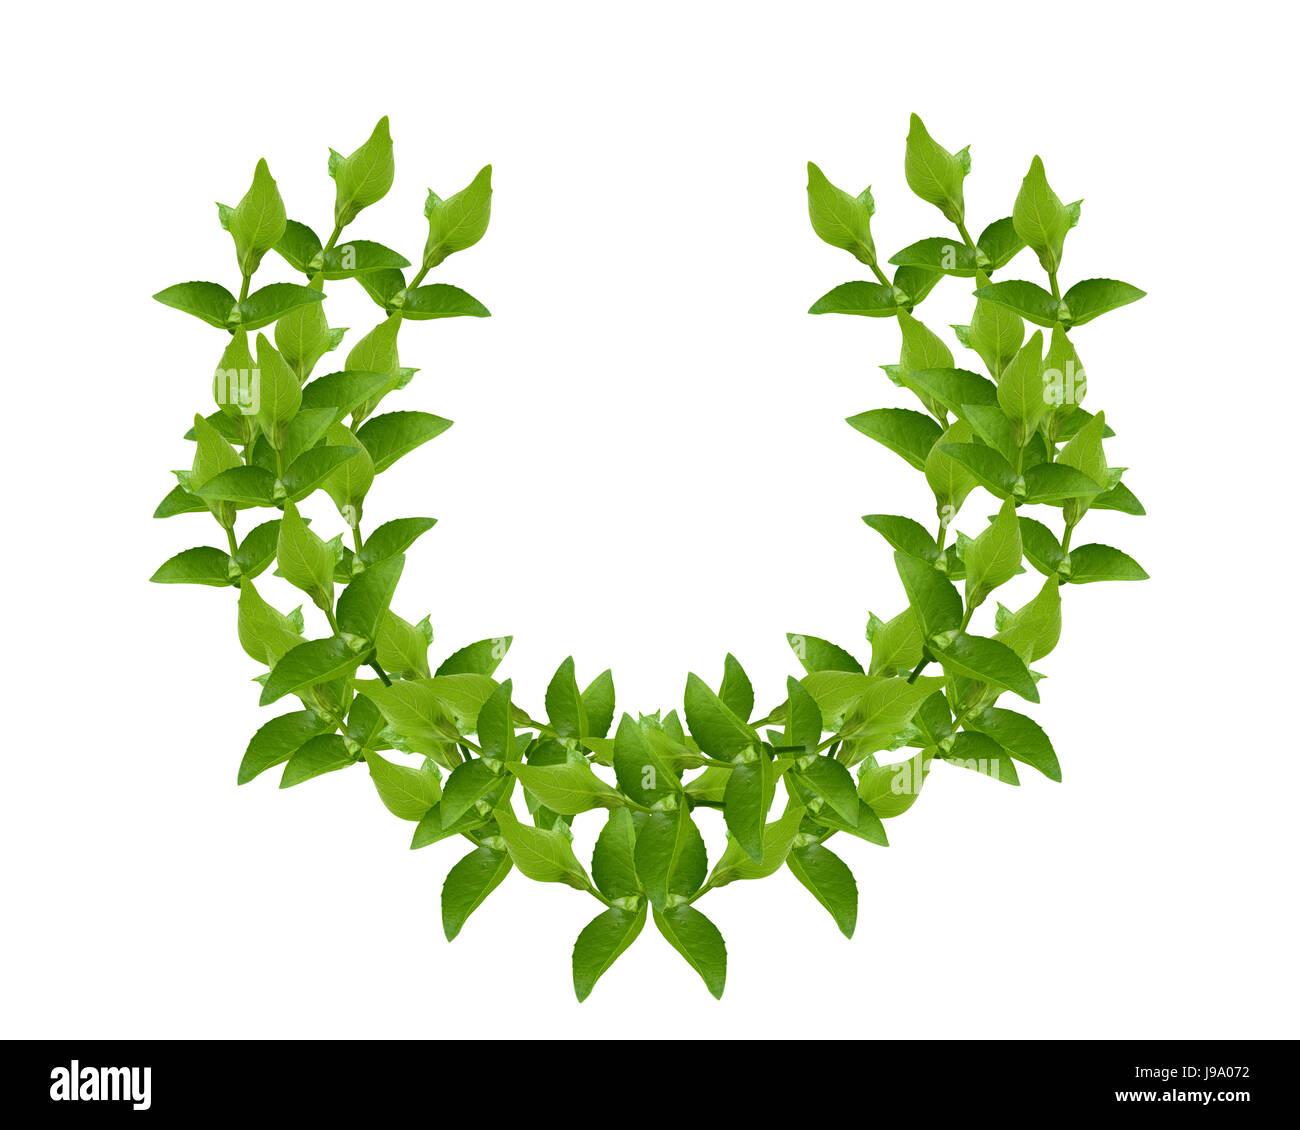 leaf, isolated, green, bloom, blossom, flourish, flourishing, greece, greek, - Stock Image